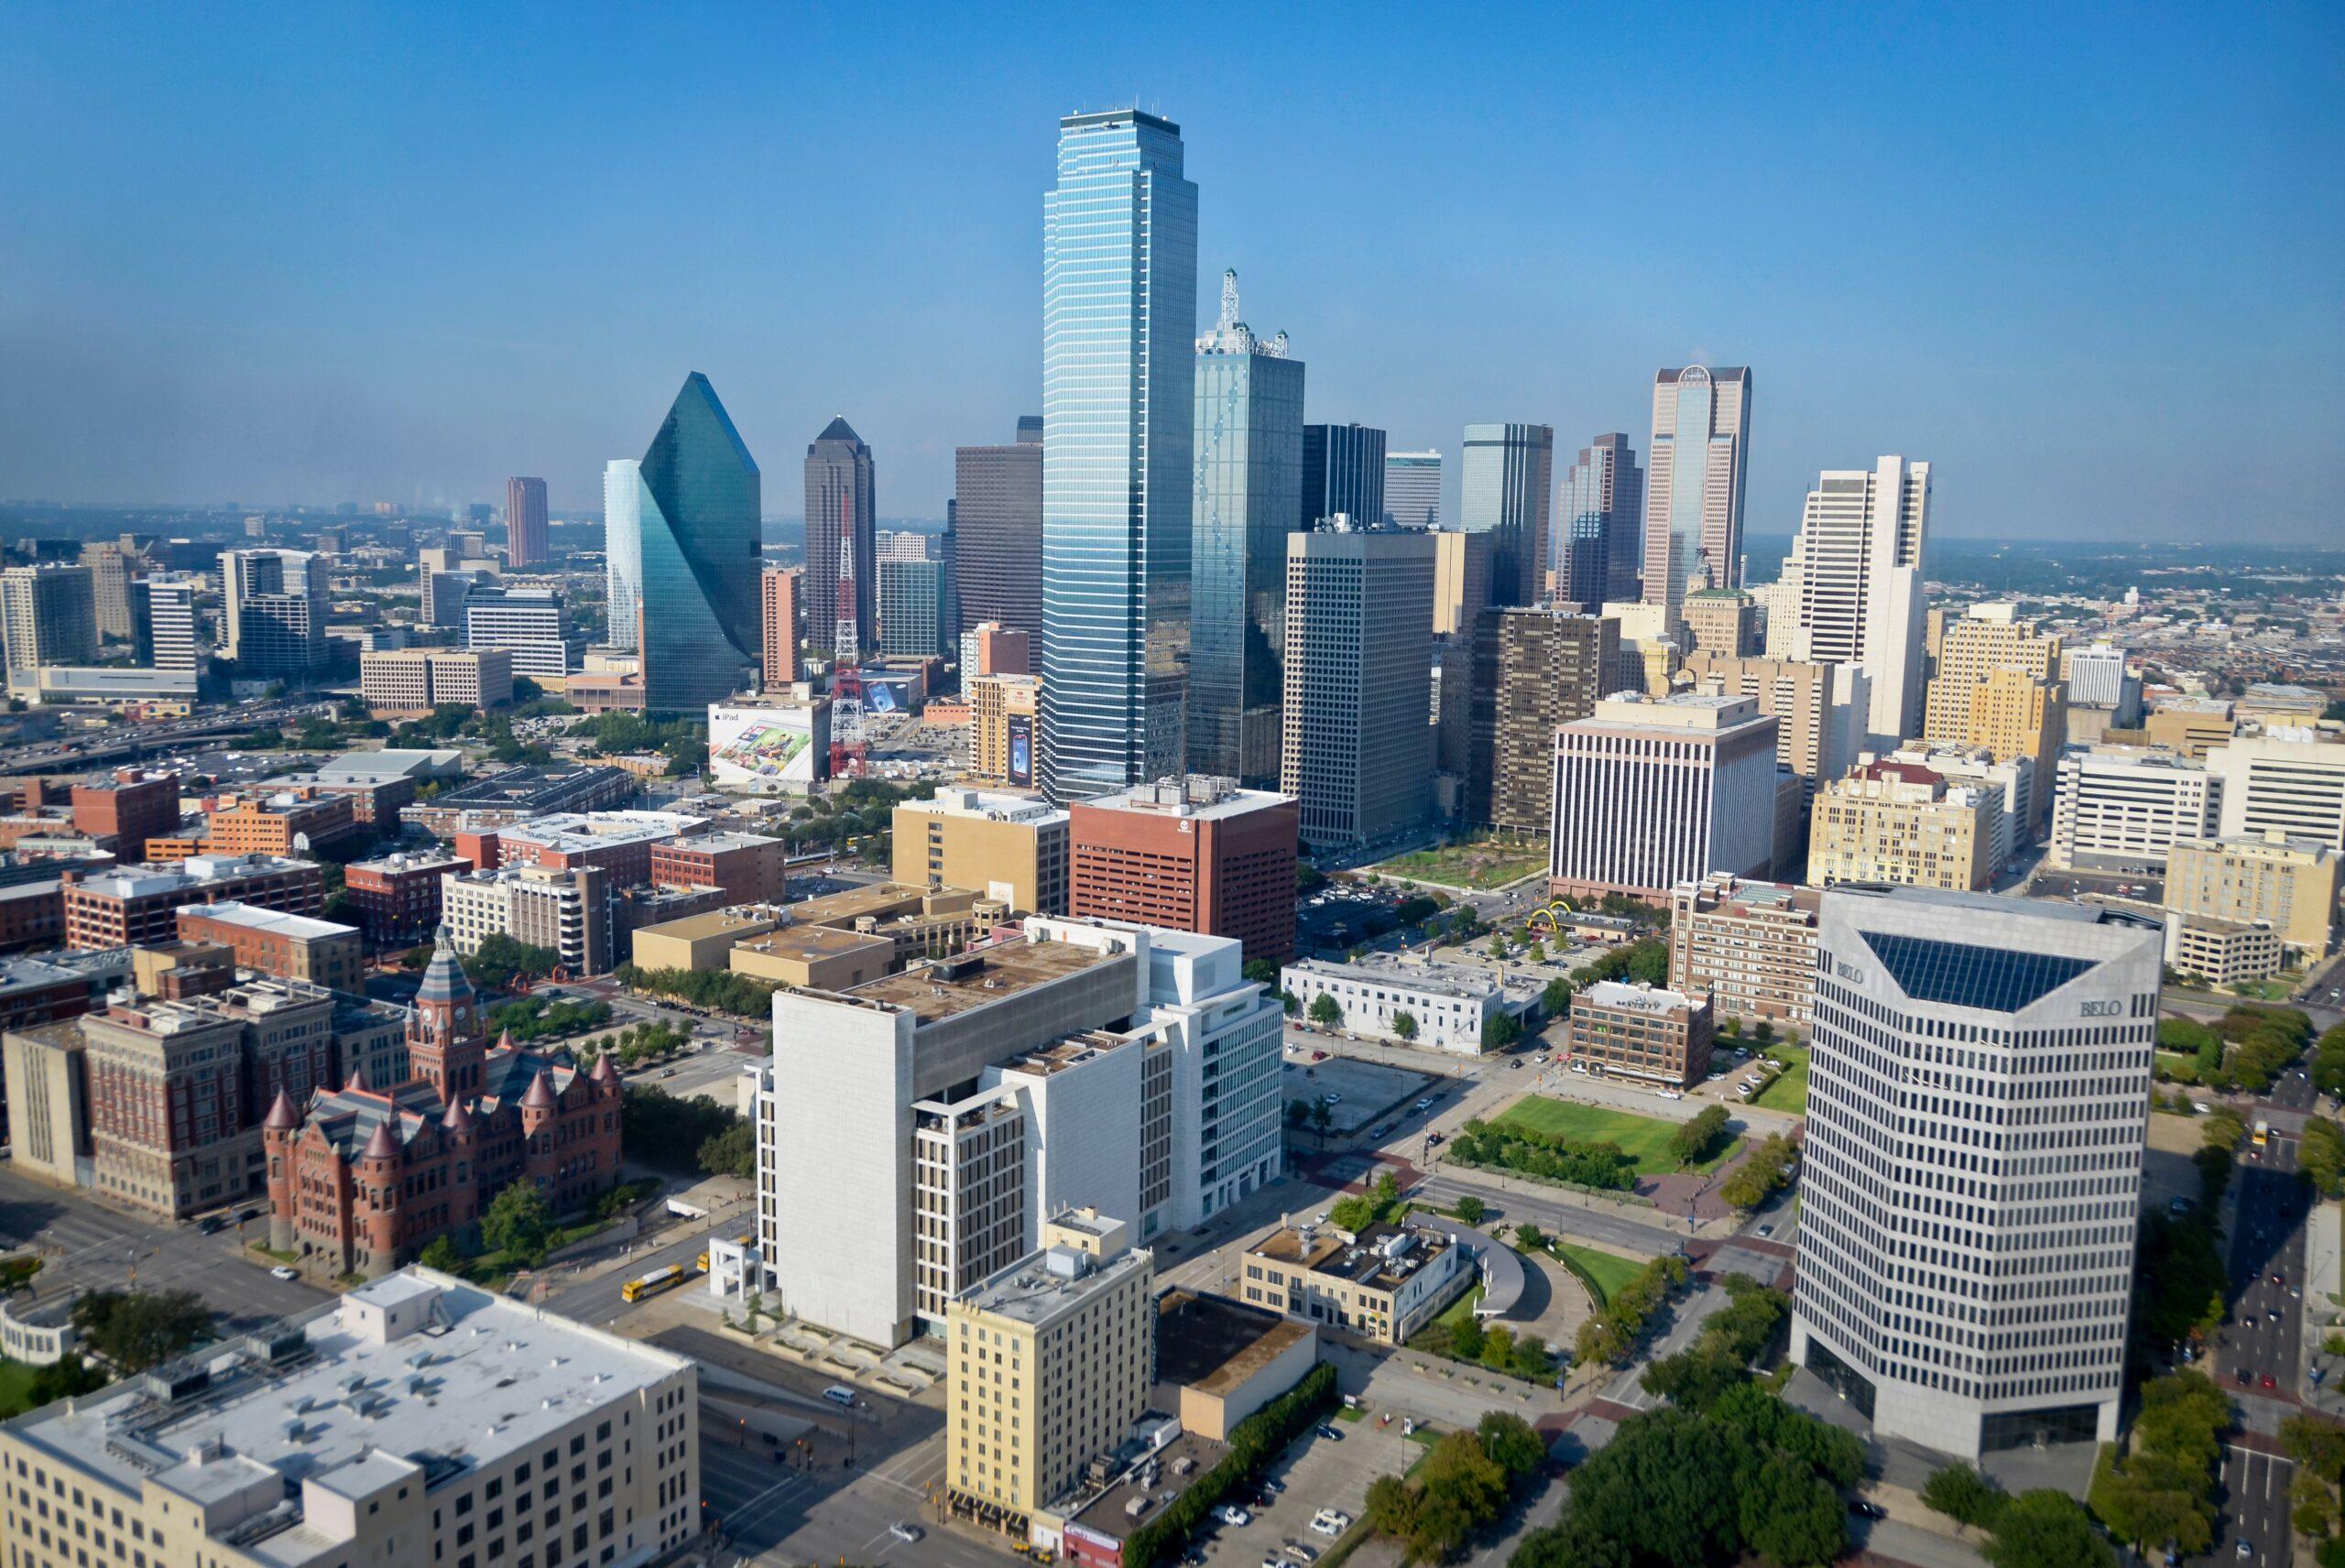 Honeymoon Destinations Near Dallas, Texas